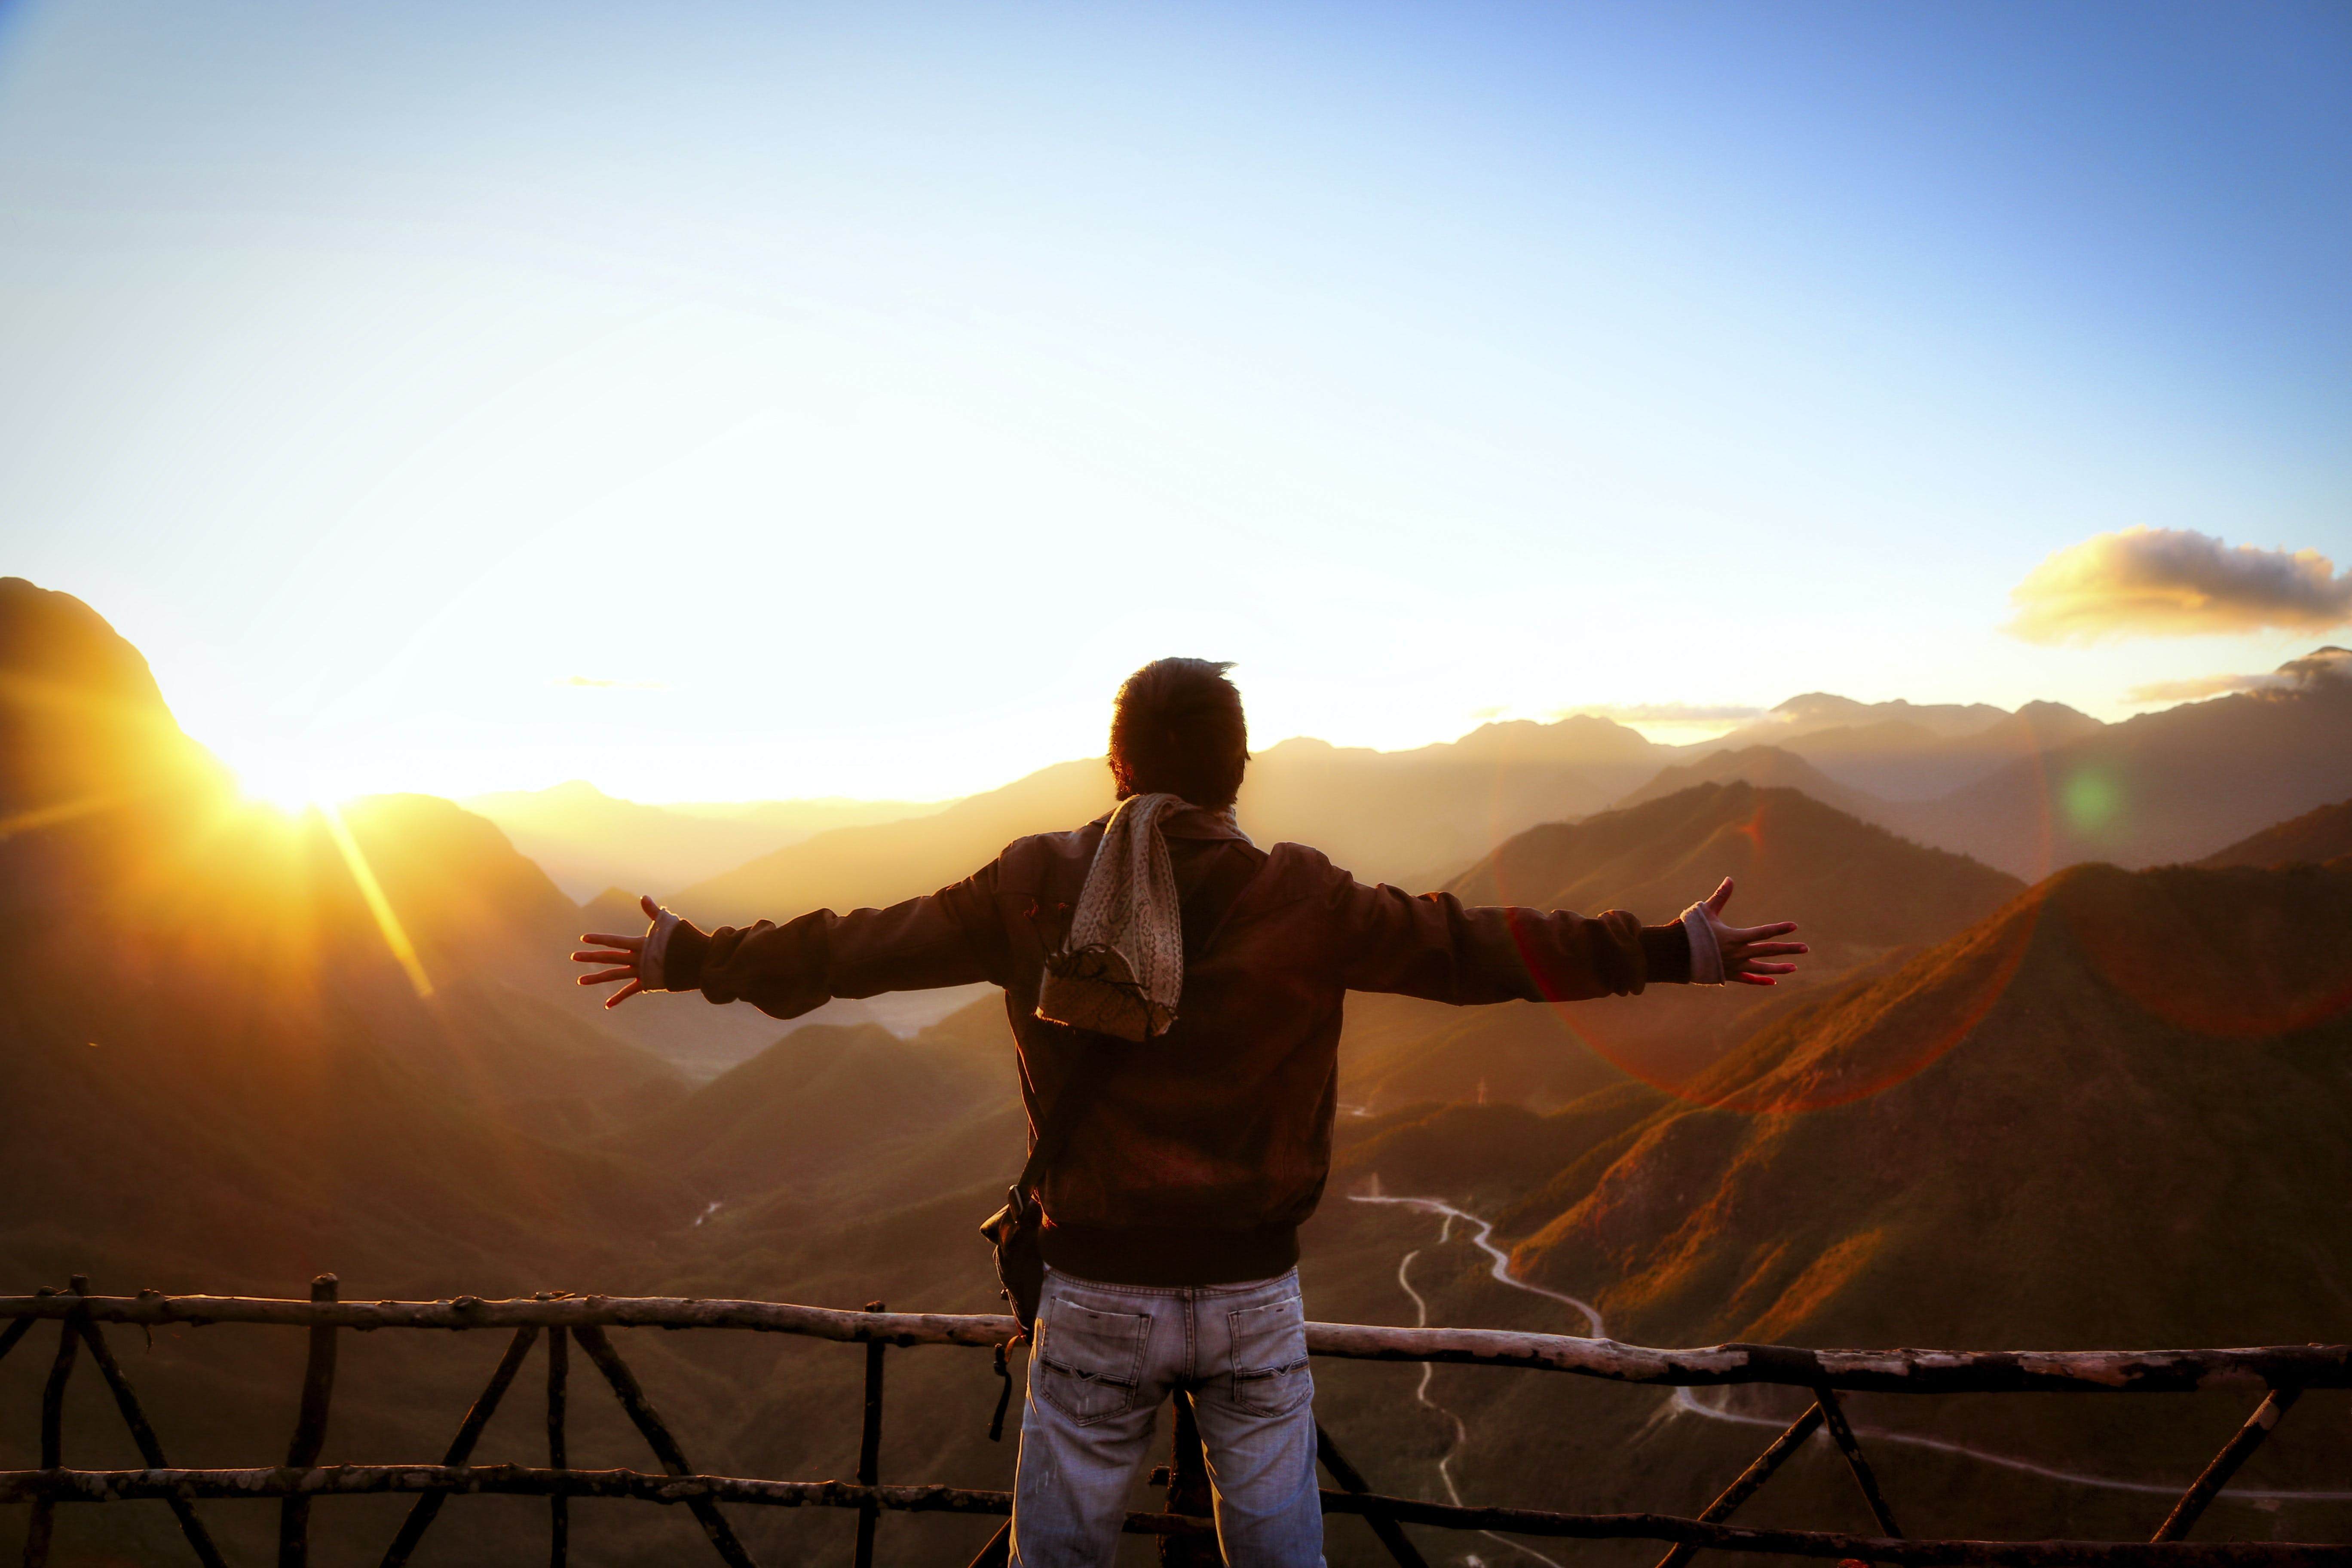 Man in Black Jacket Standing Near Sunset